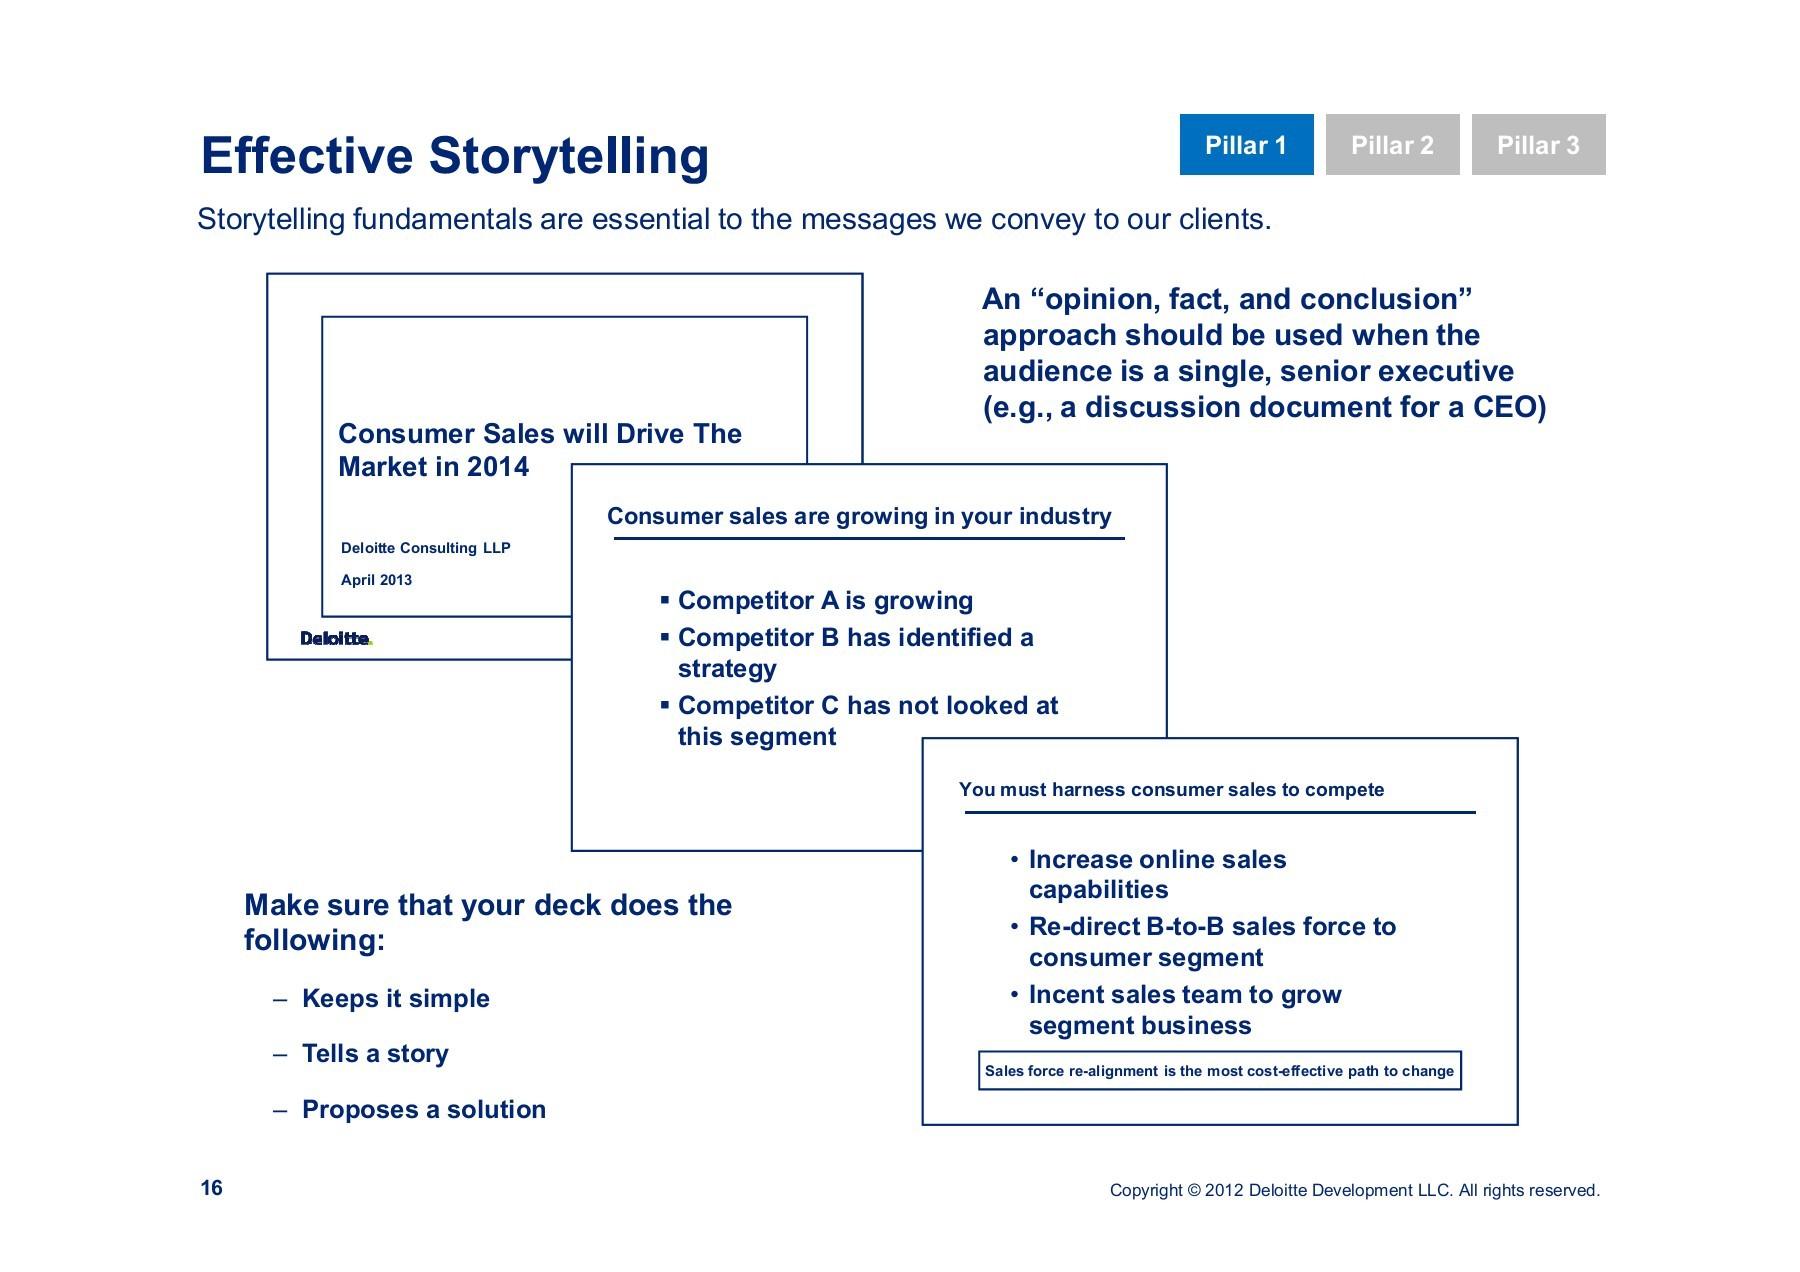 Deloitte Consulting Johnson Case Competition   Focusky